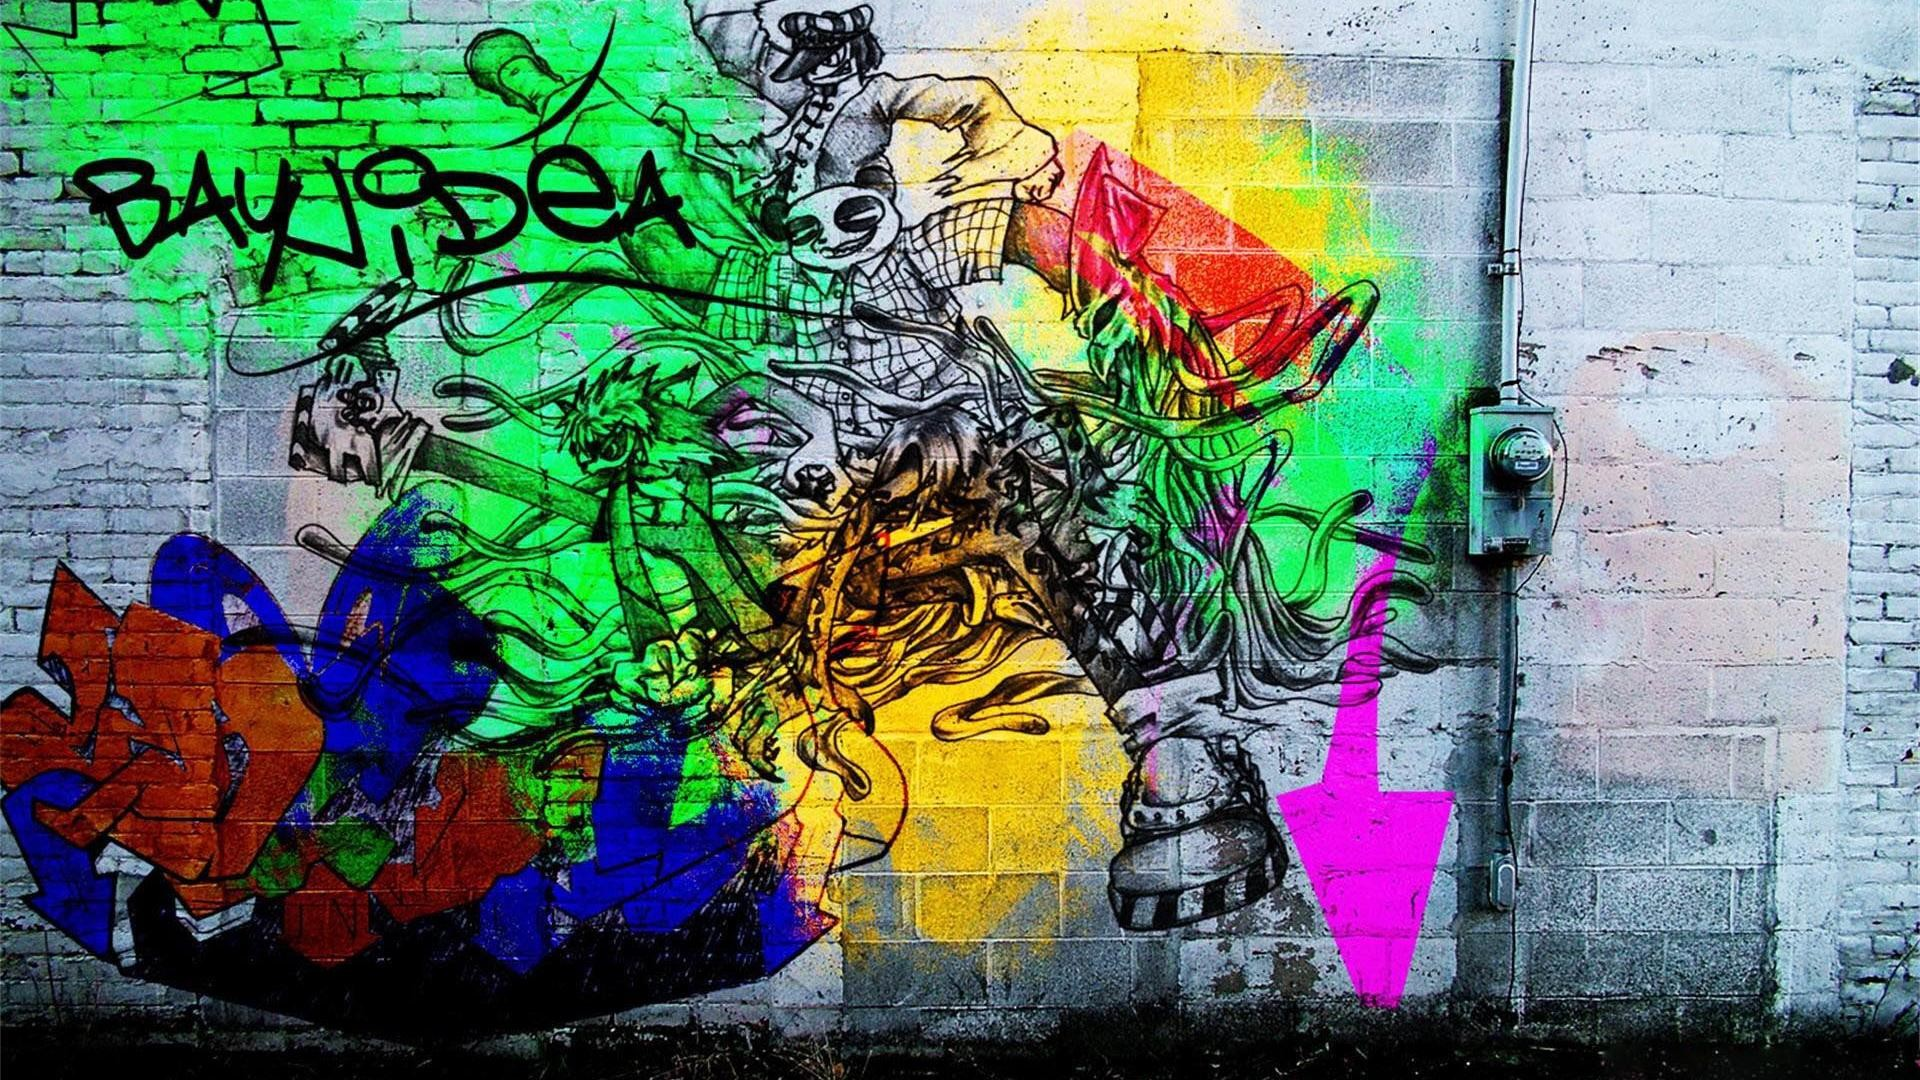 graffiti wallpaper desktops laptop wallpapers images 1920×1080